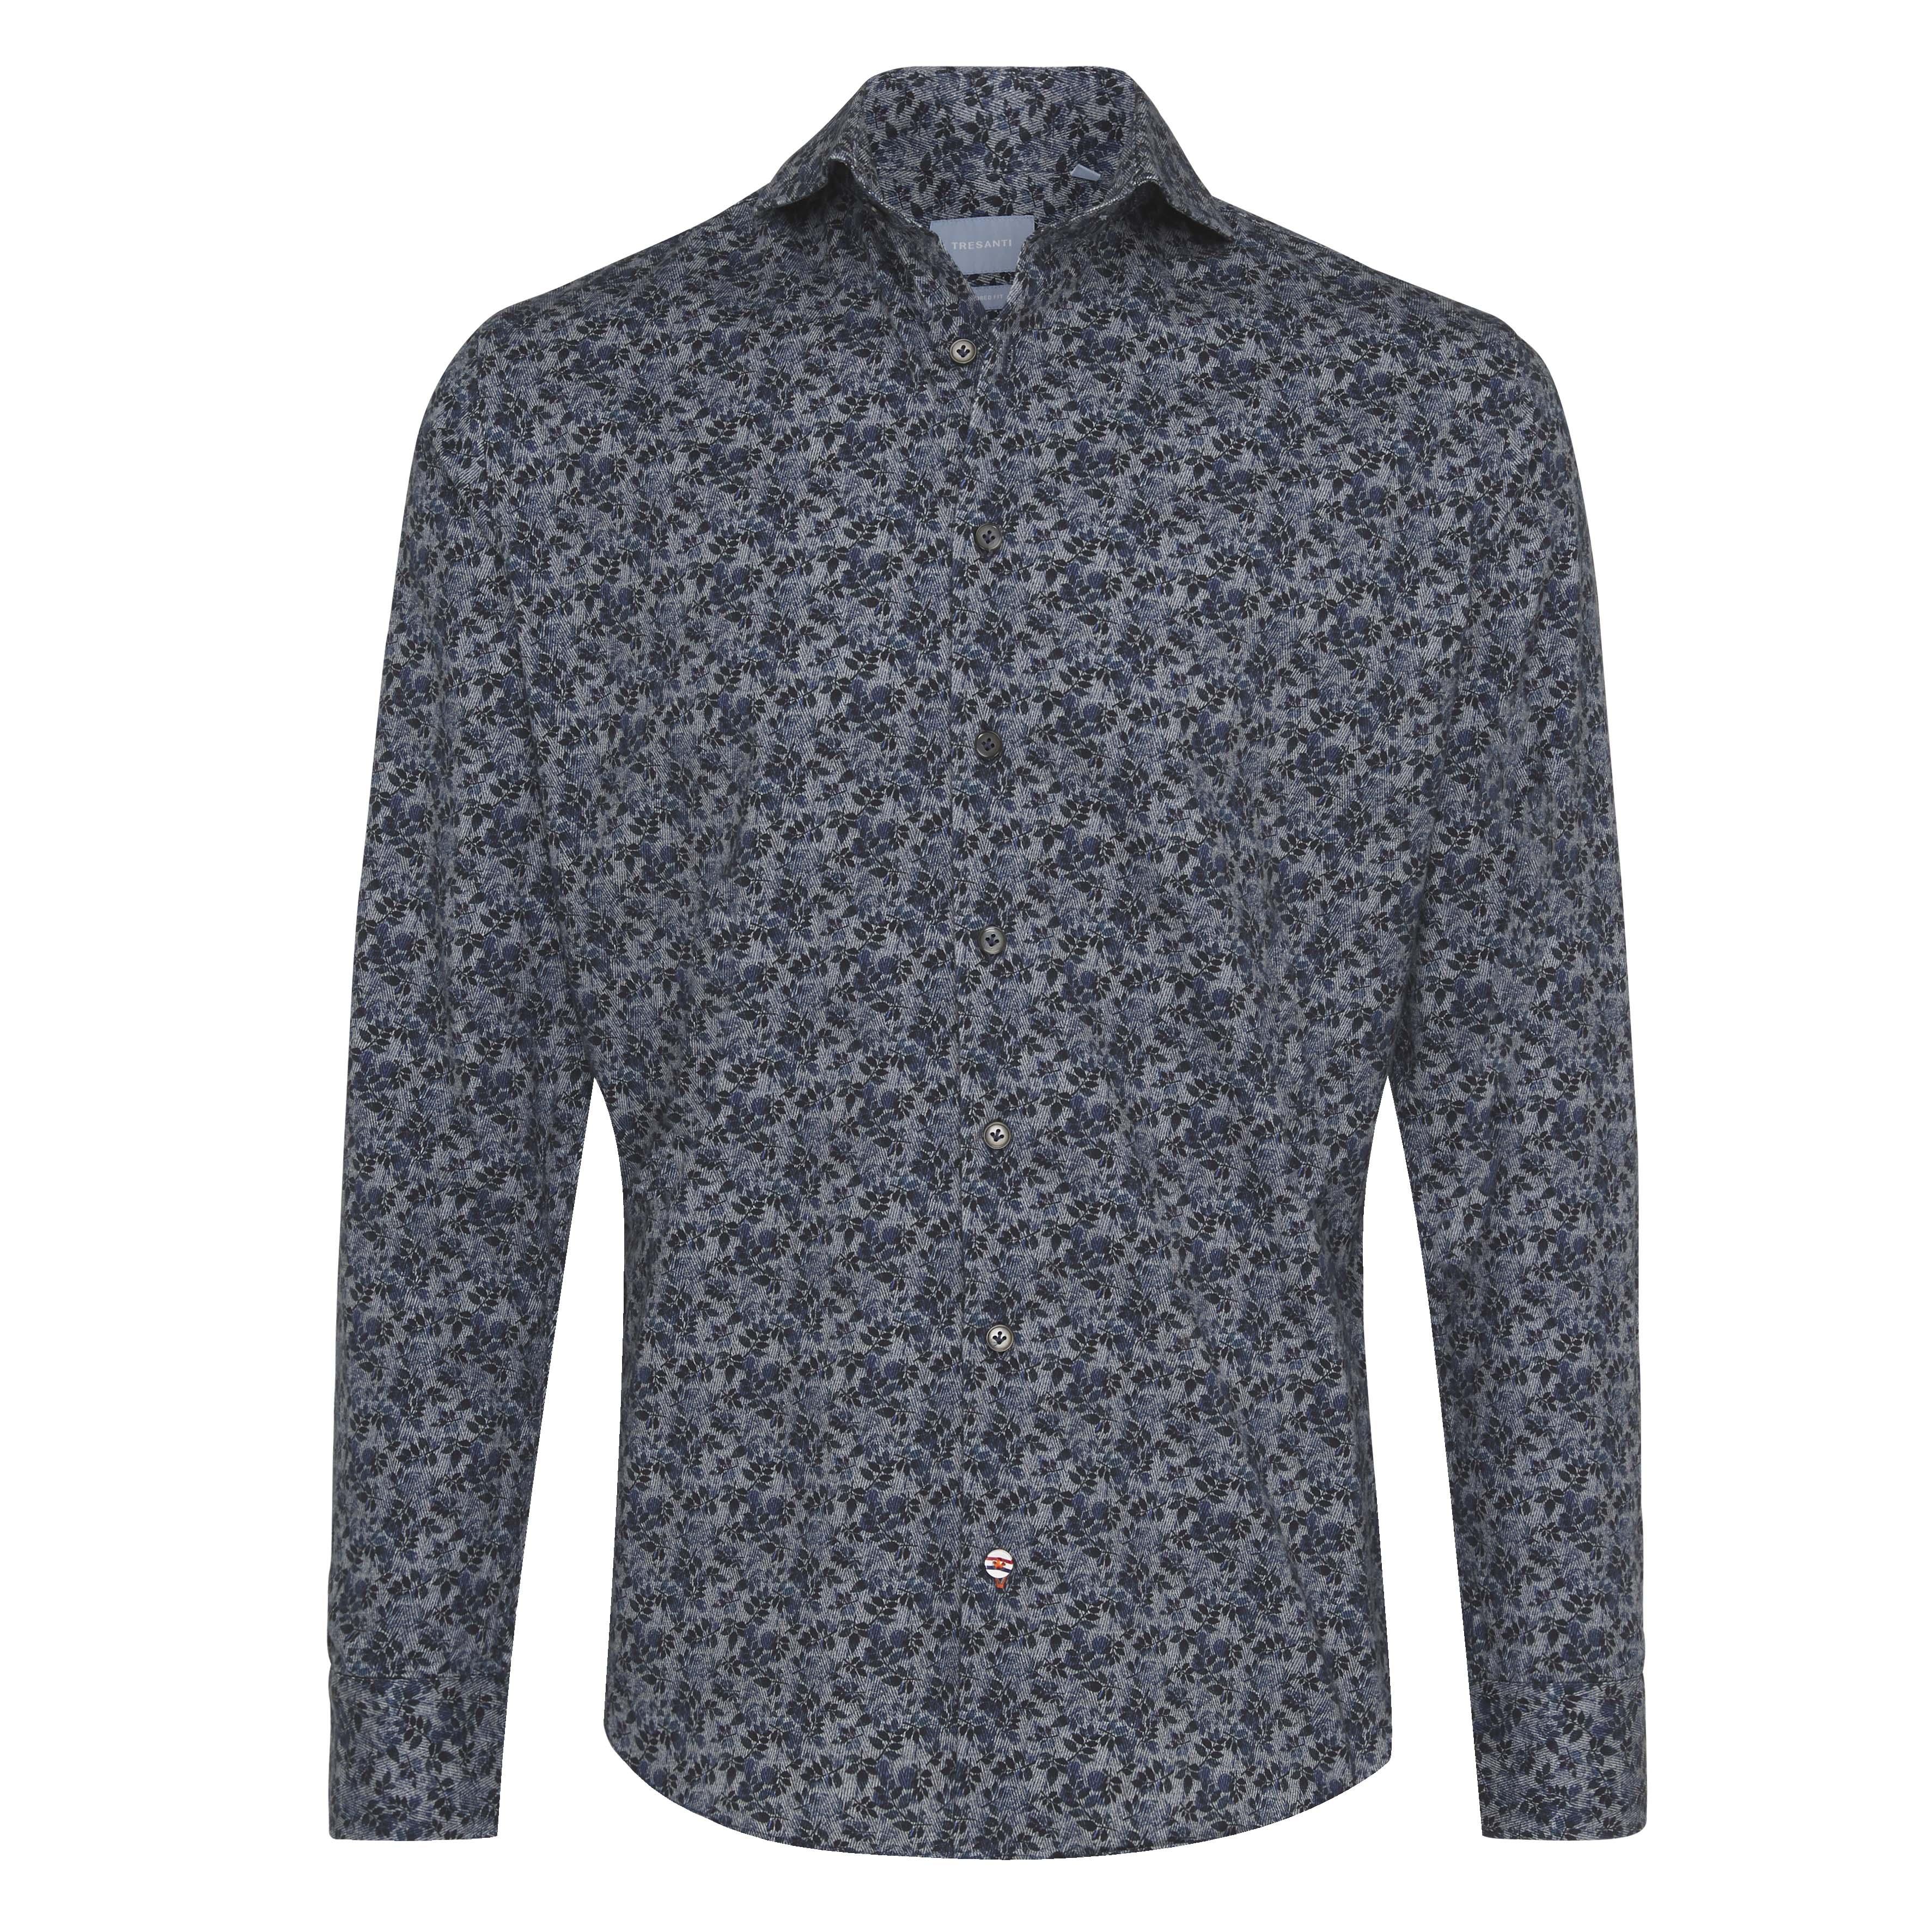 Jericho   Shirt flower print on herringbone blue